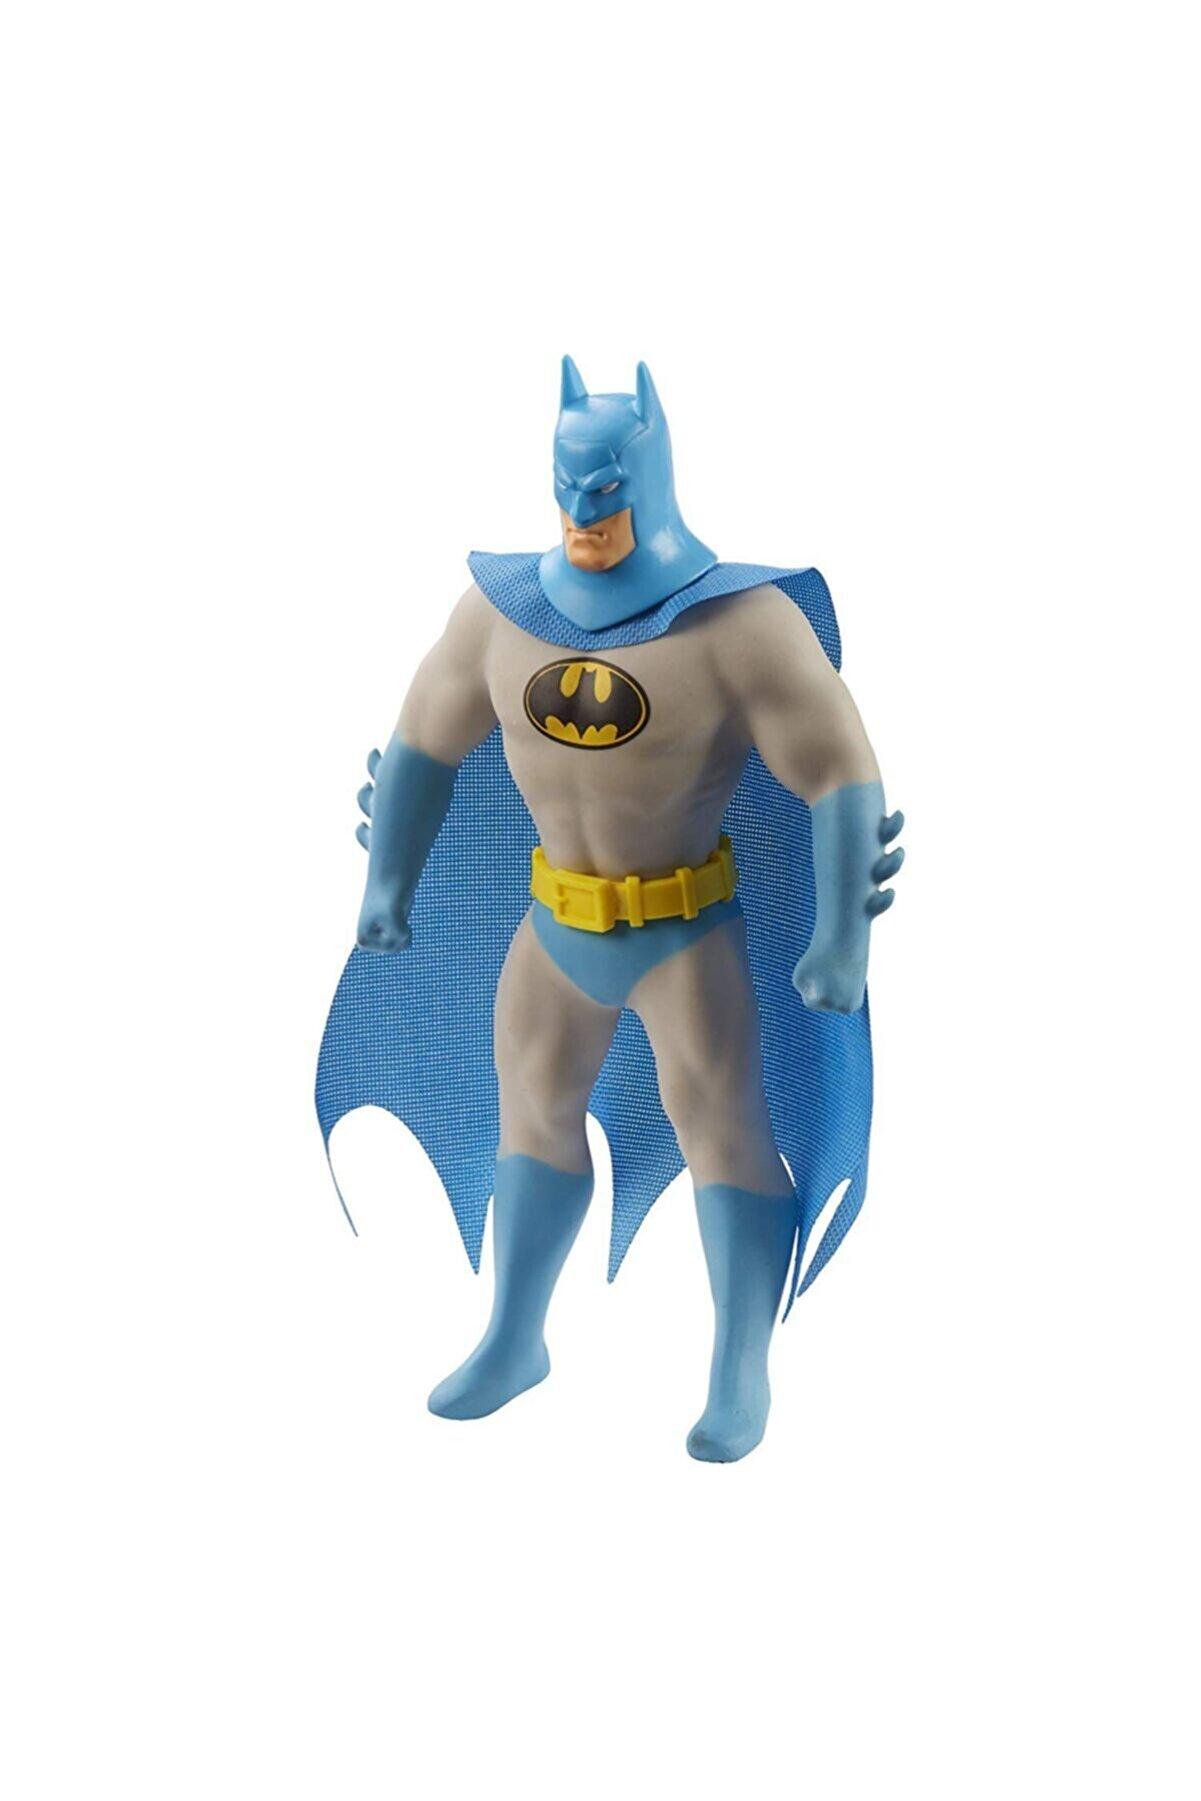 Batman Stretch Armstrong 15cm Kendinden Uzayan Esneyen Adam Justice League Figür